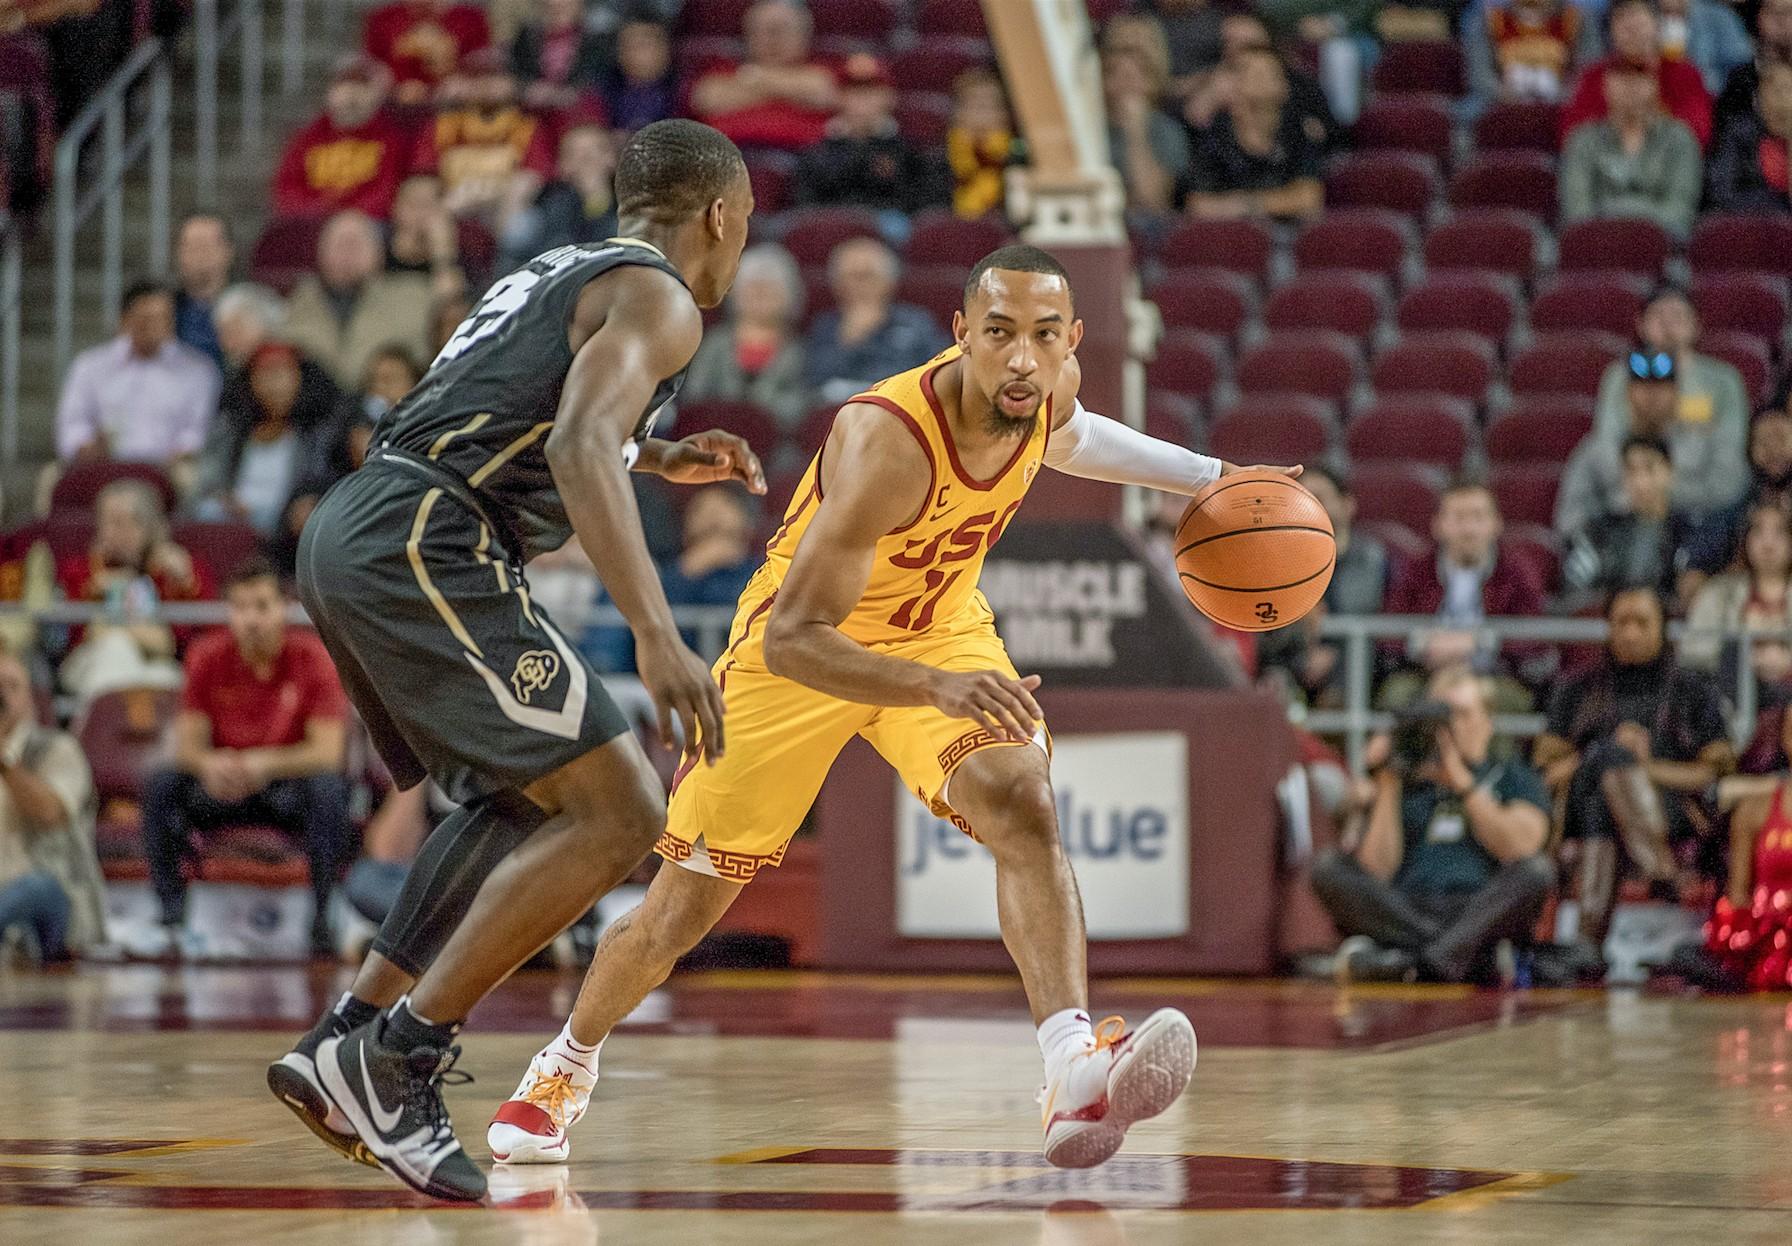 ASU women's basketball lose 77-62 to USC Trojans